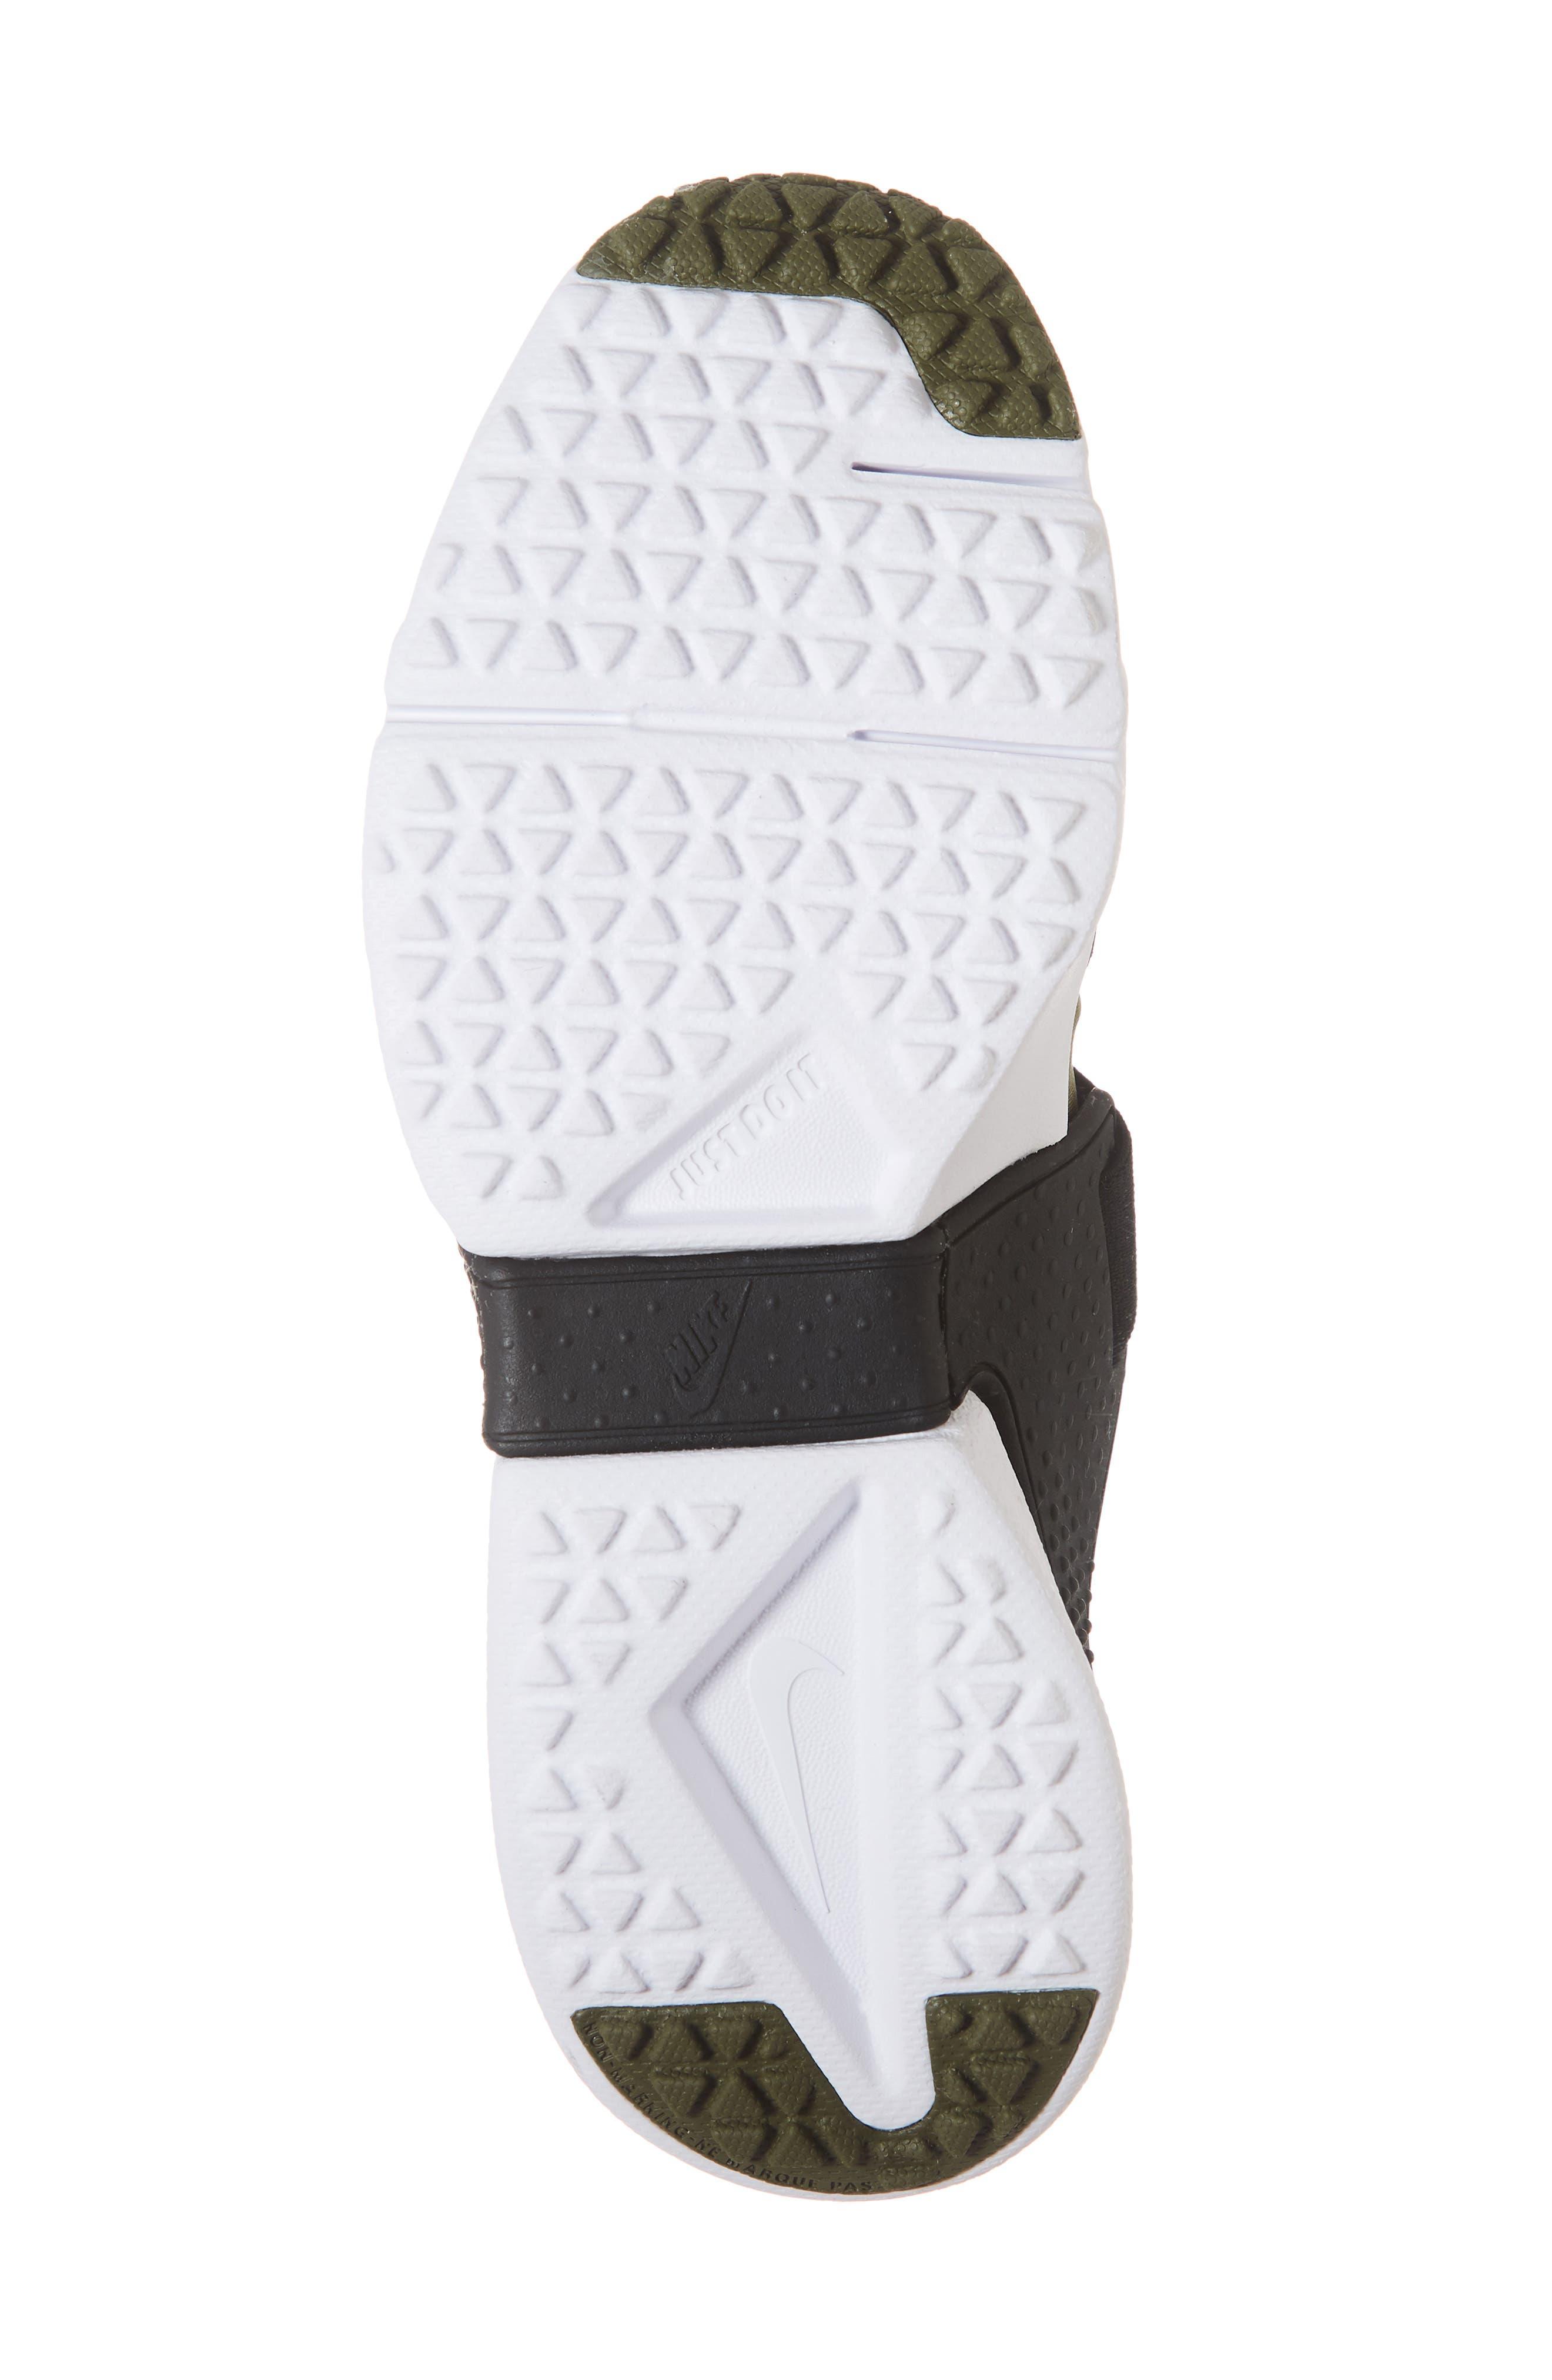 Huarache Extreme Sneaker,                             Alternate thumbnail 6, color,                             Olive/ Wolf Grey/ Black/ White